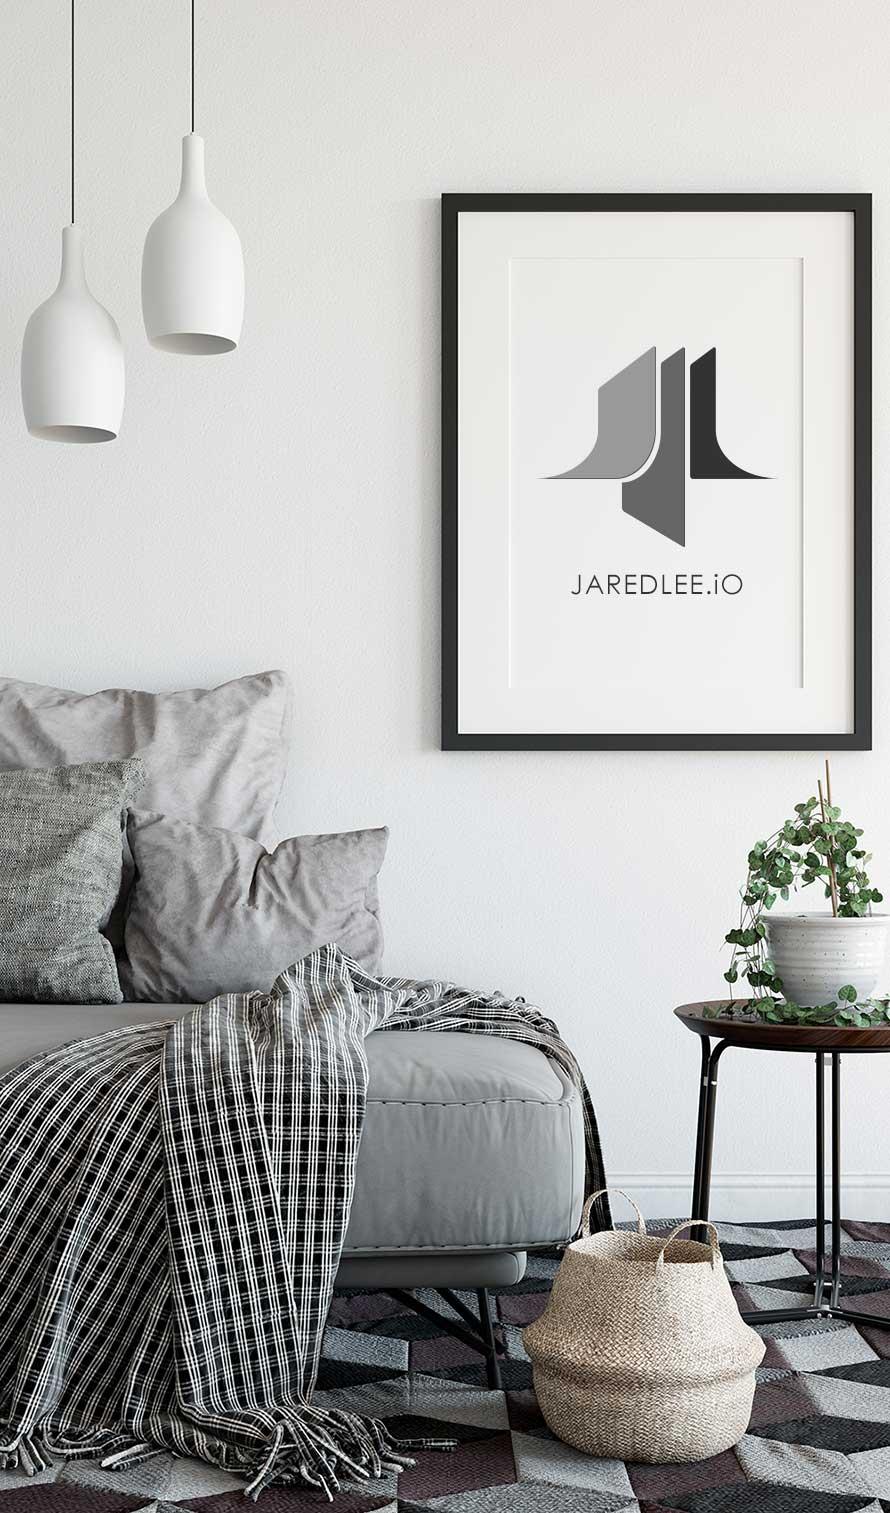 Jared-Lee-Airbnb-Guest-Experience-3.jpg